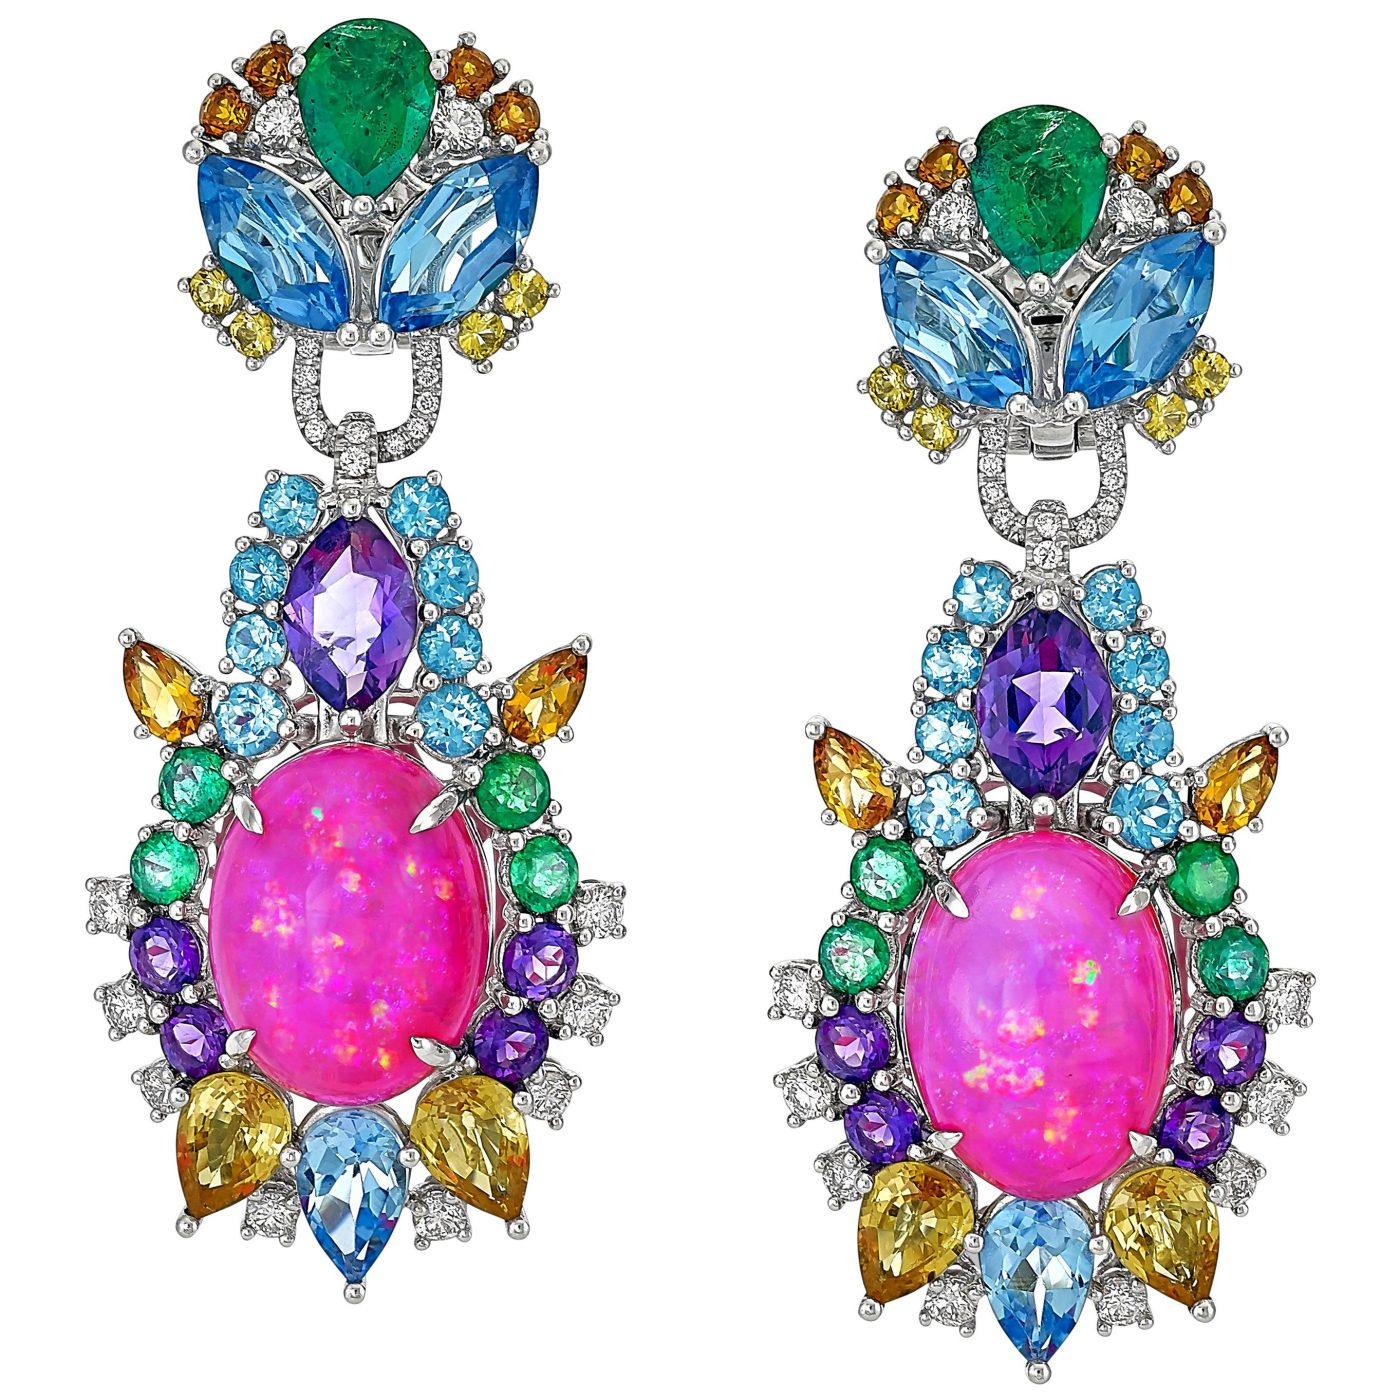 Pink Opal, Diamond, Emerald, Sapphire, Topaz and Citrine Starburst Earrings